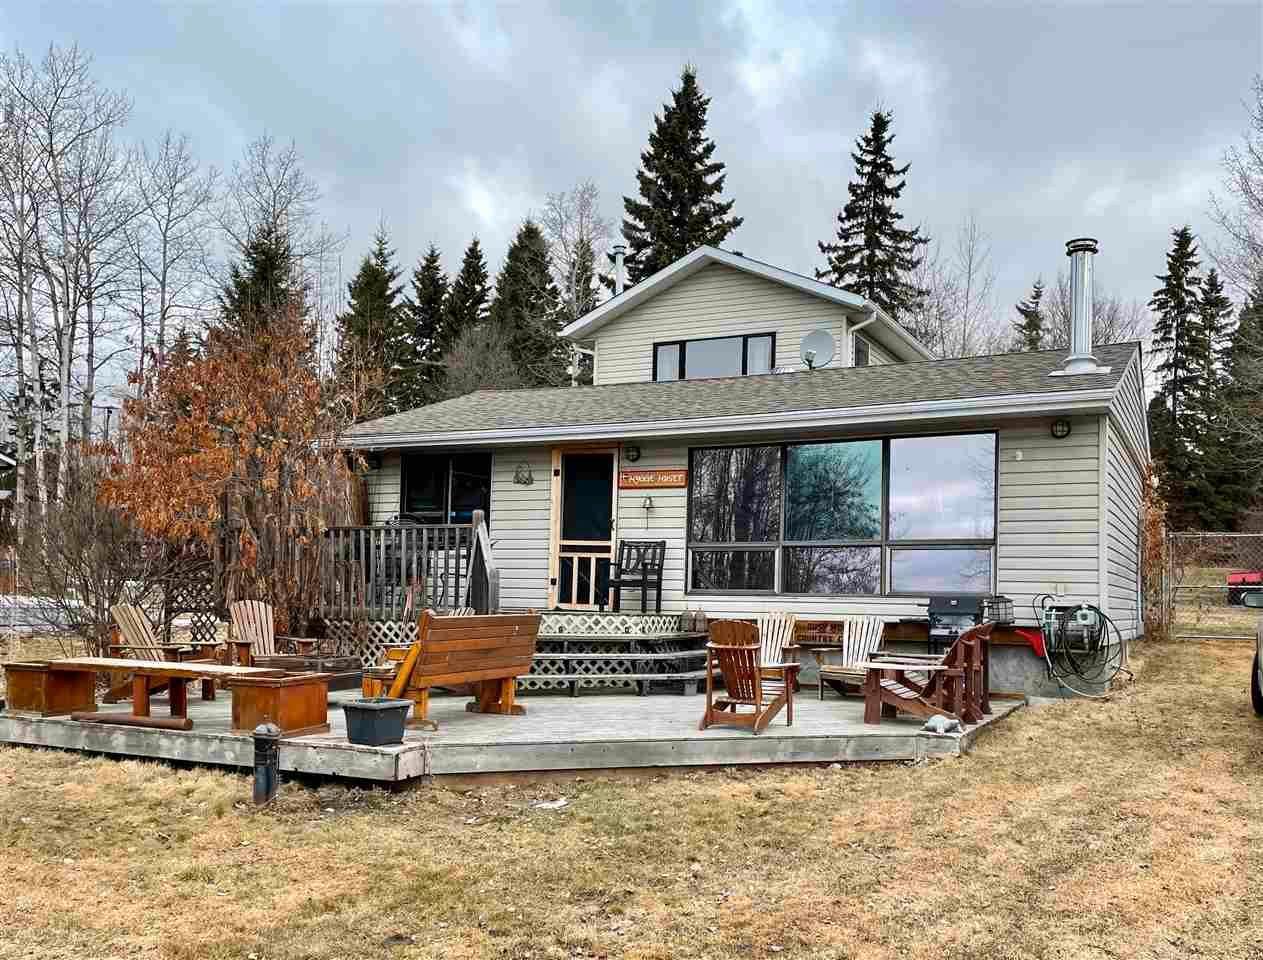 Main Photo: 640 47402 RGE RD 13: Rural Leduc County House for sale : MLS®# E4229952